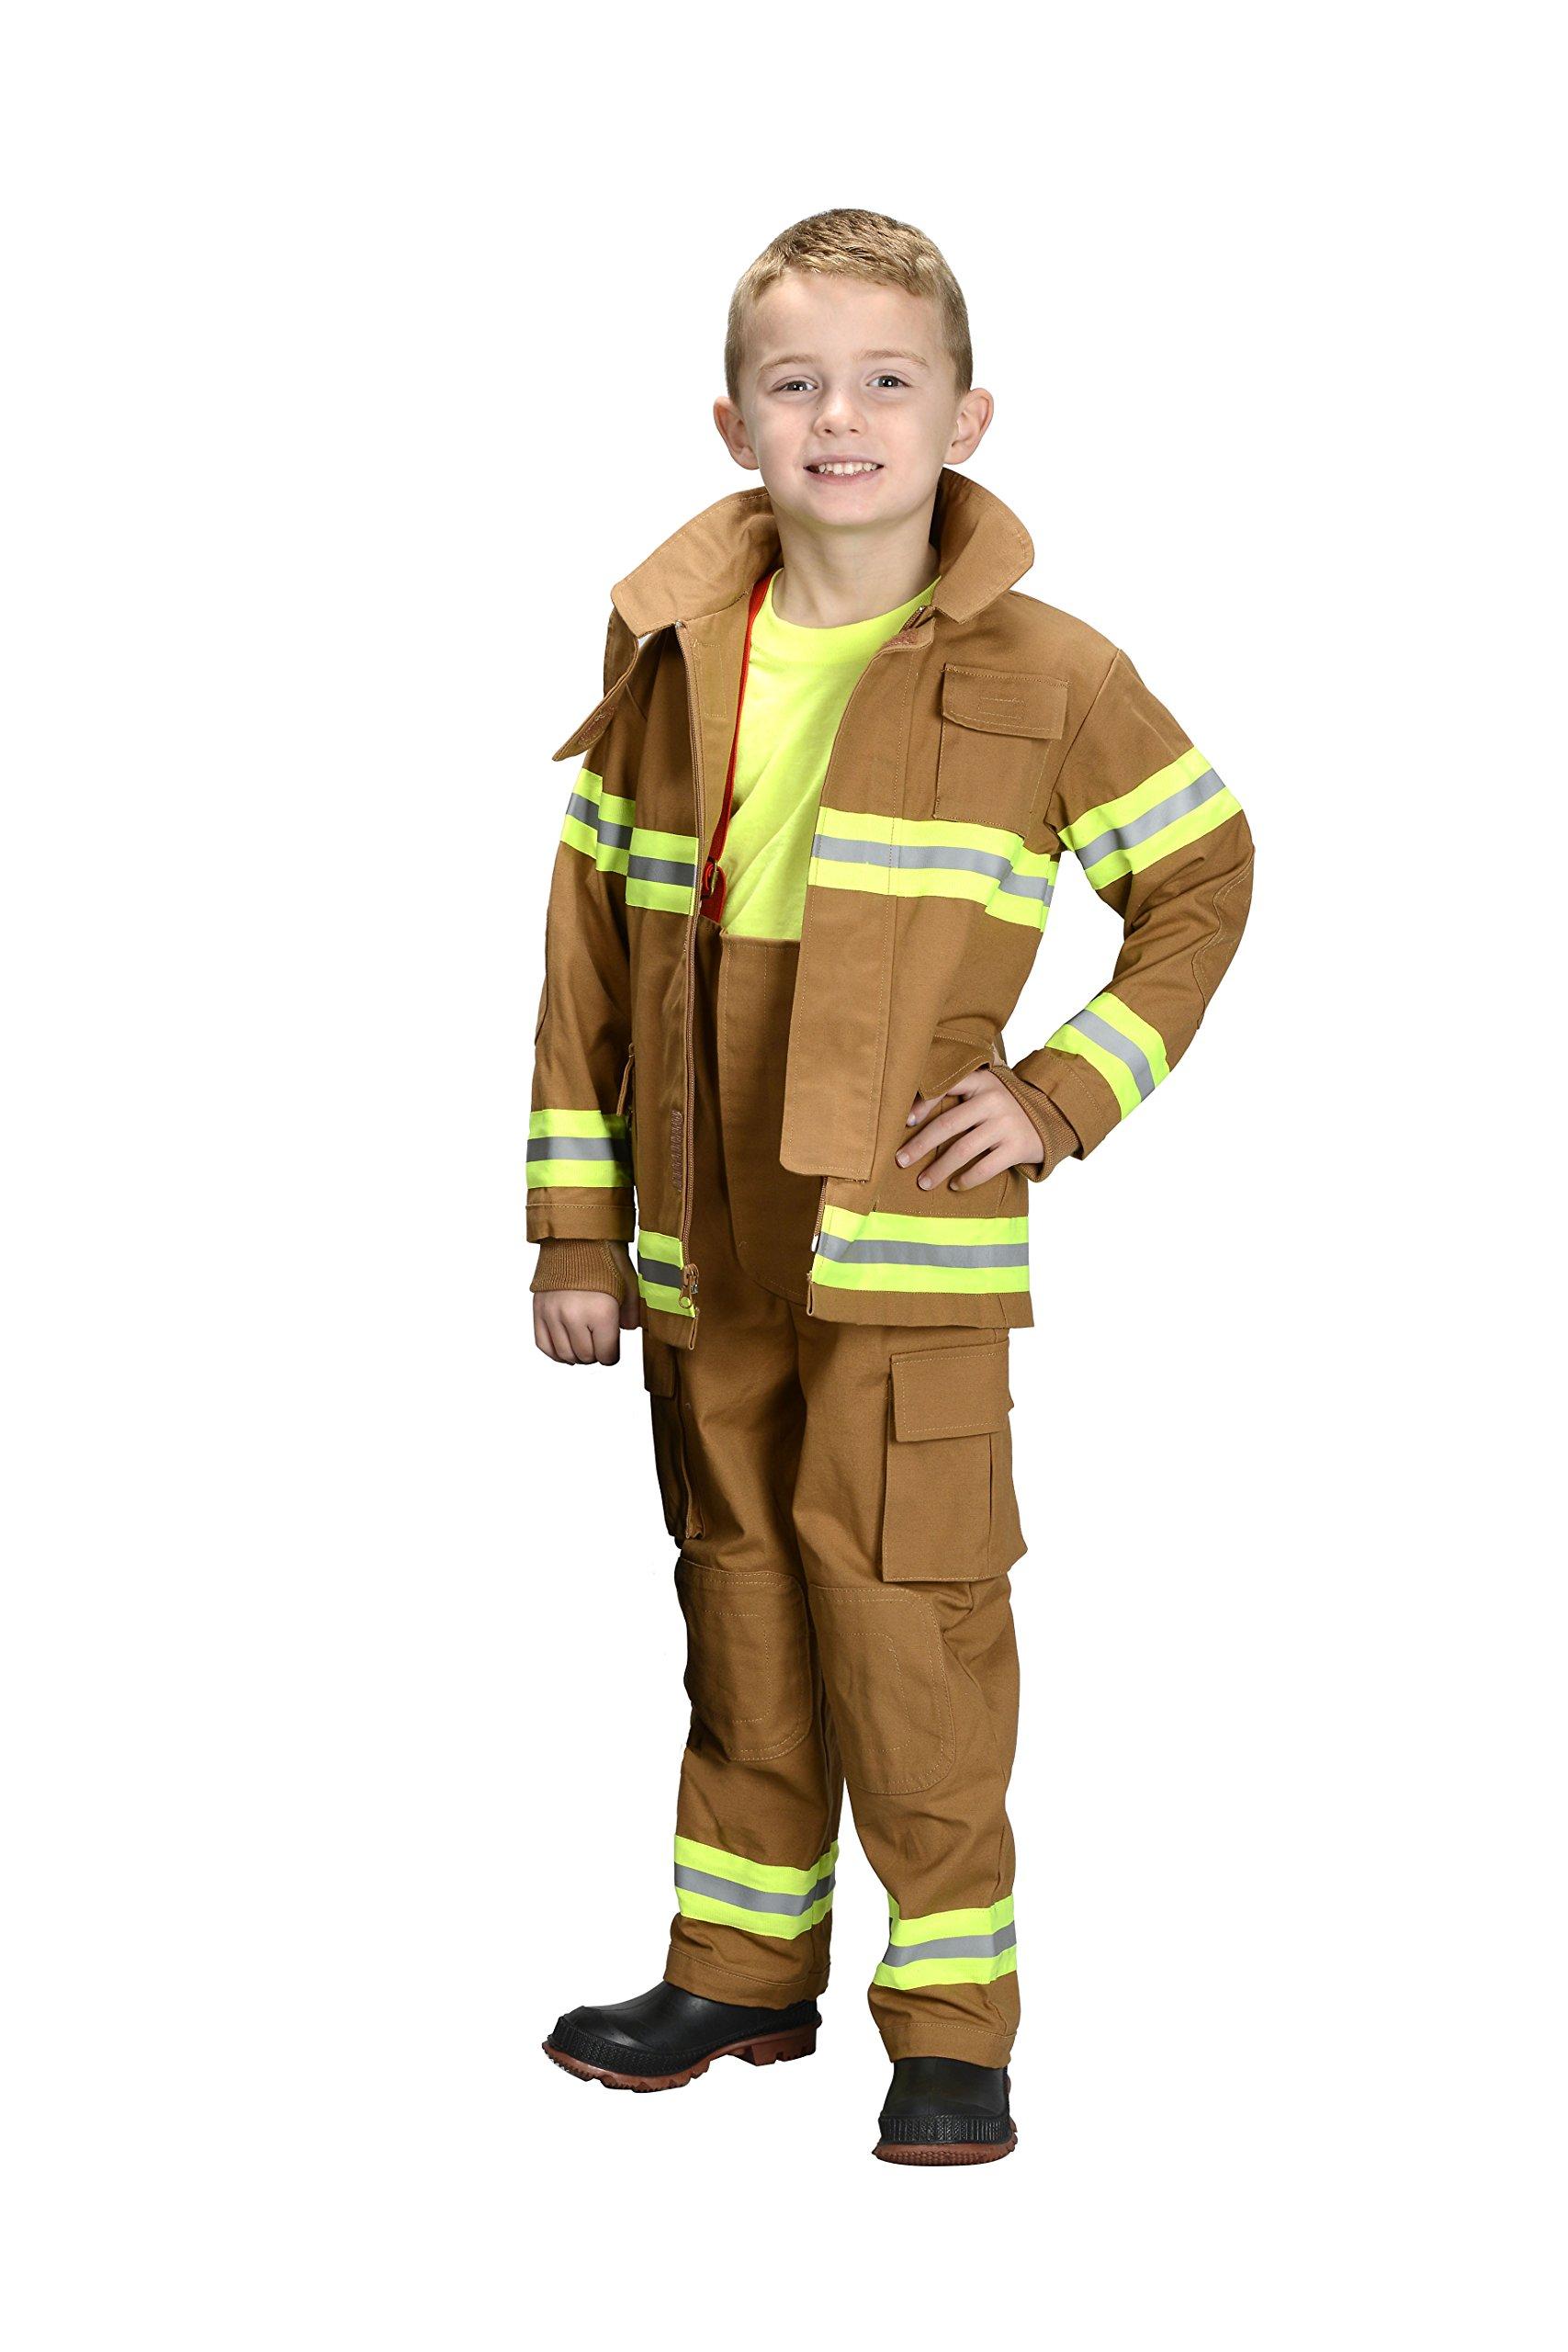 Aeromax Jr. Fire Fighter Suit, Tan, Size 2/3